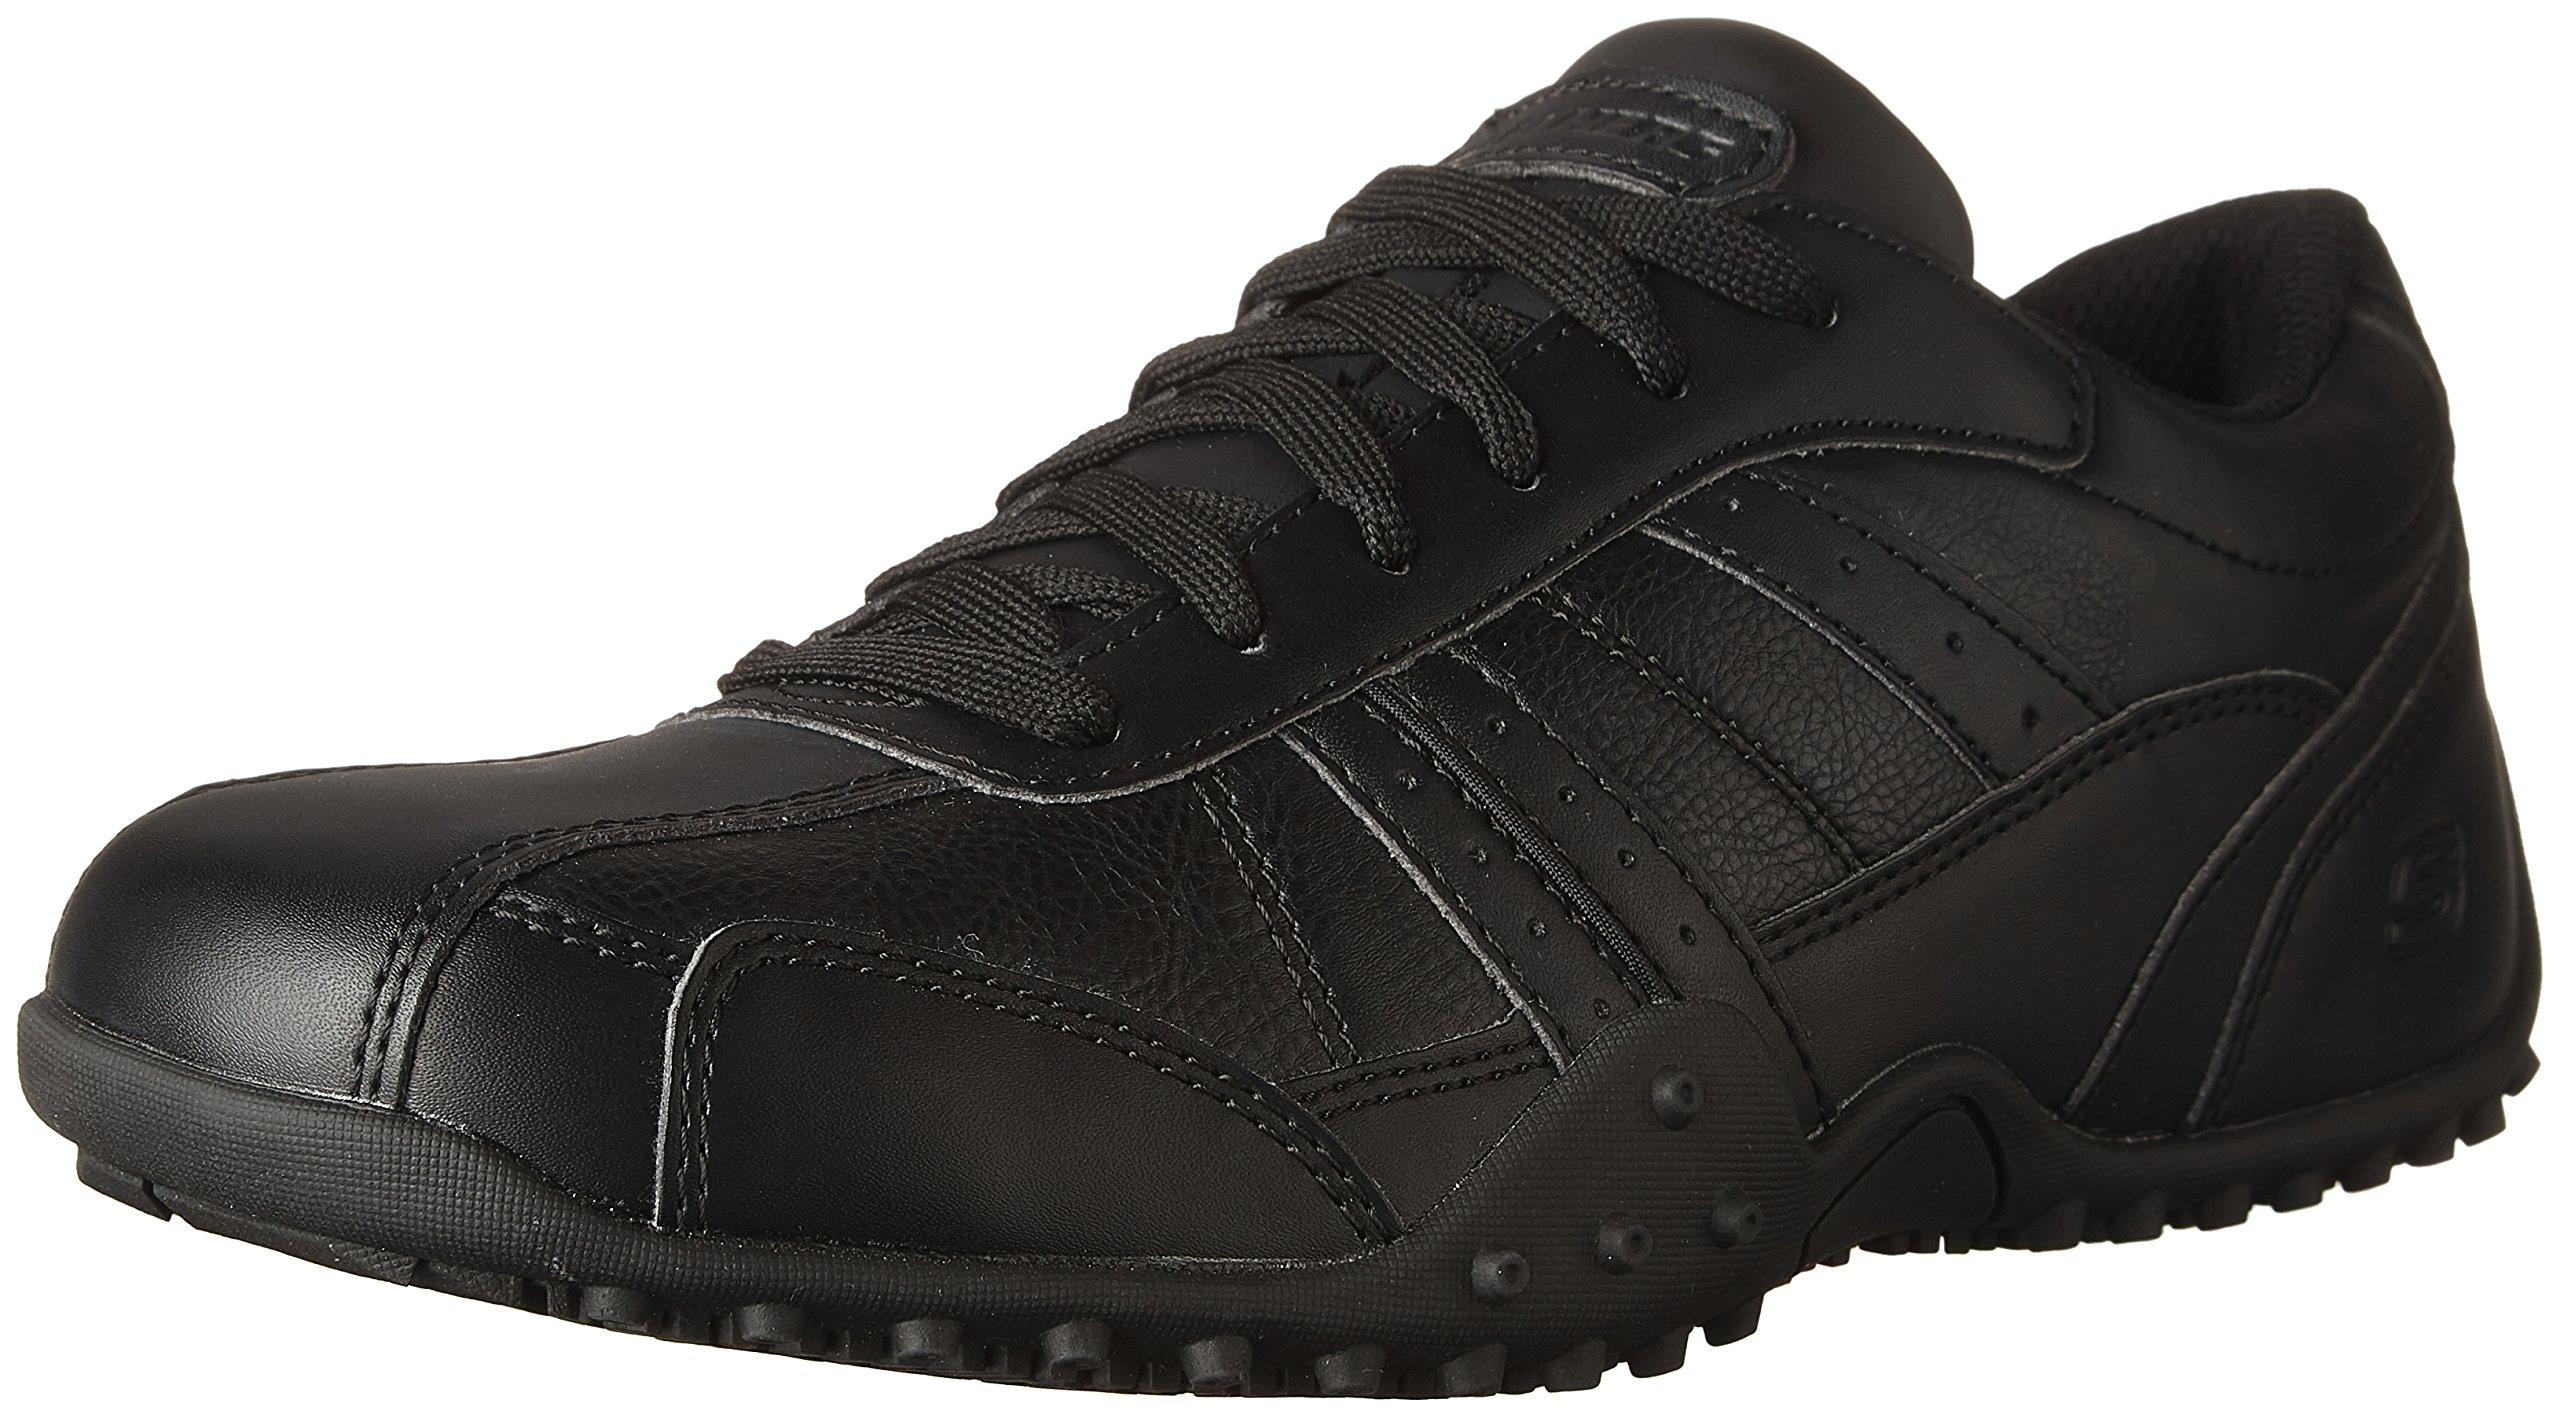 Skechers for Work Men's Elston Relaxed Fit Resistant Work Shoe, Black, 8.5 M US